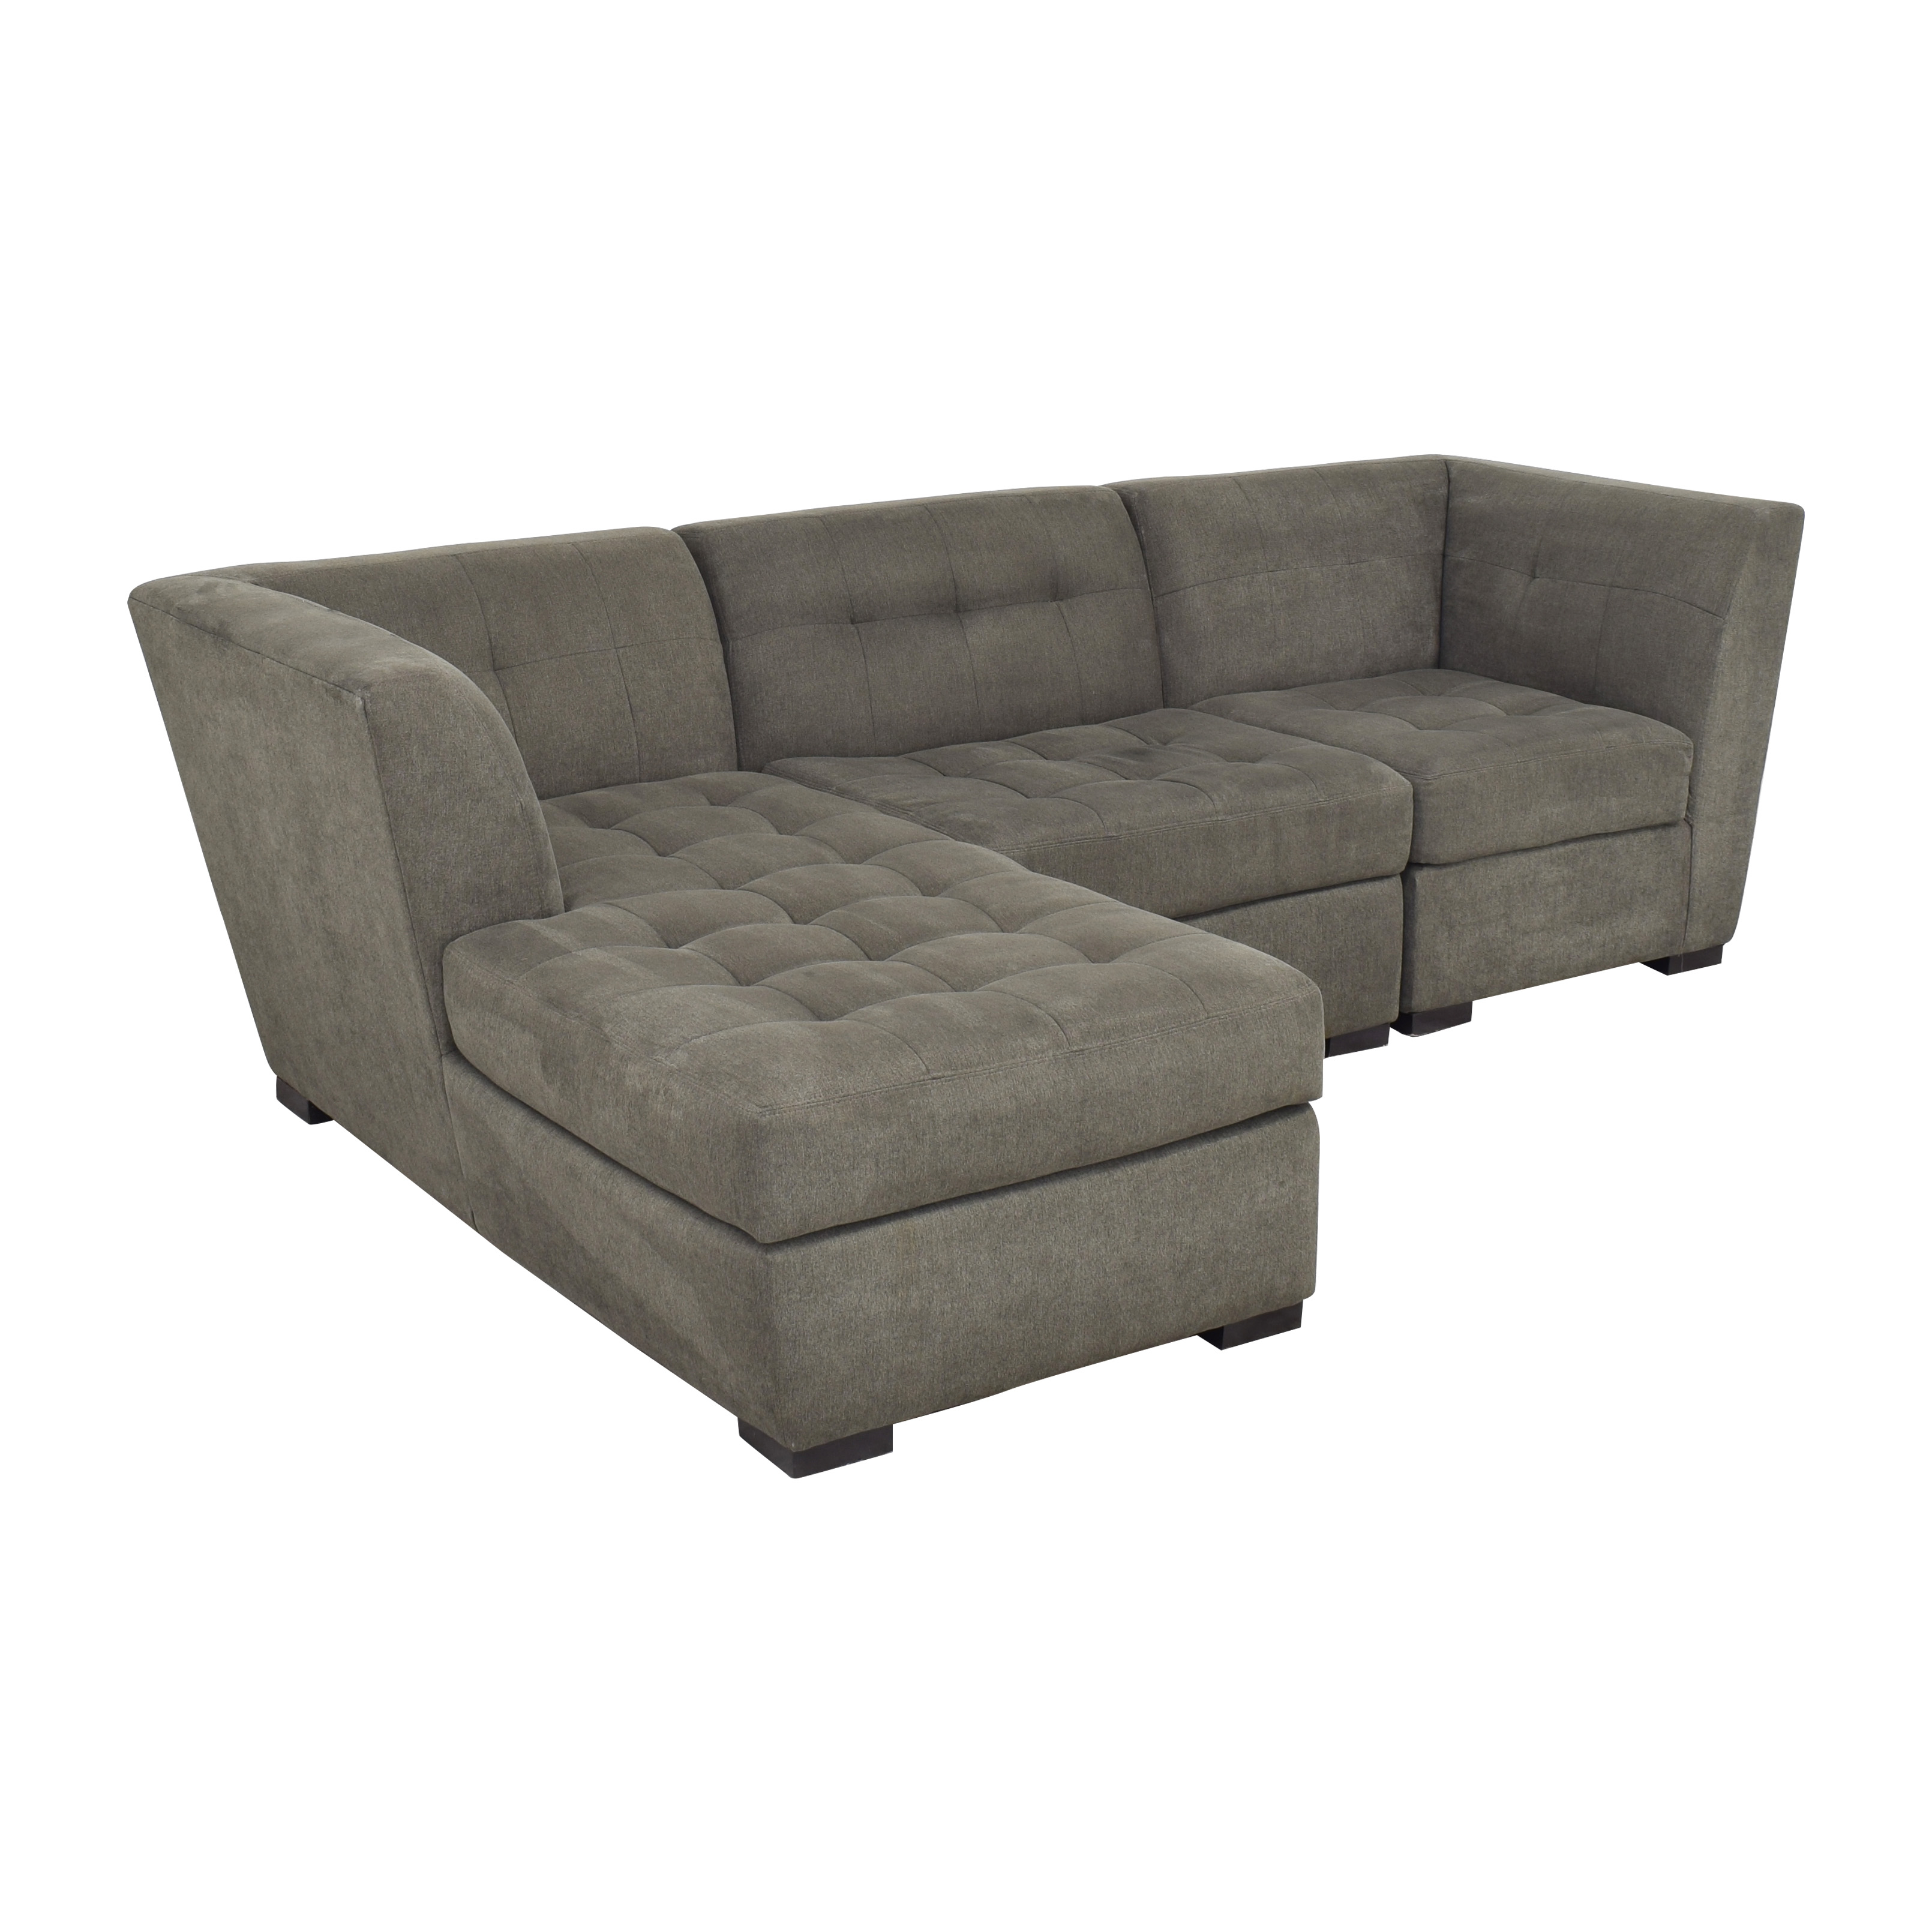 Jonathan Louis Jonathan Louis Roxanne II Chaise Sectional Sofa dark grey